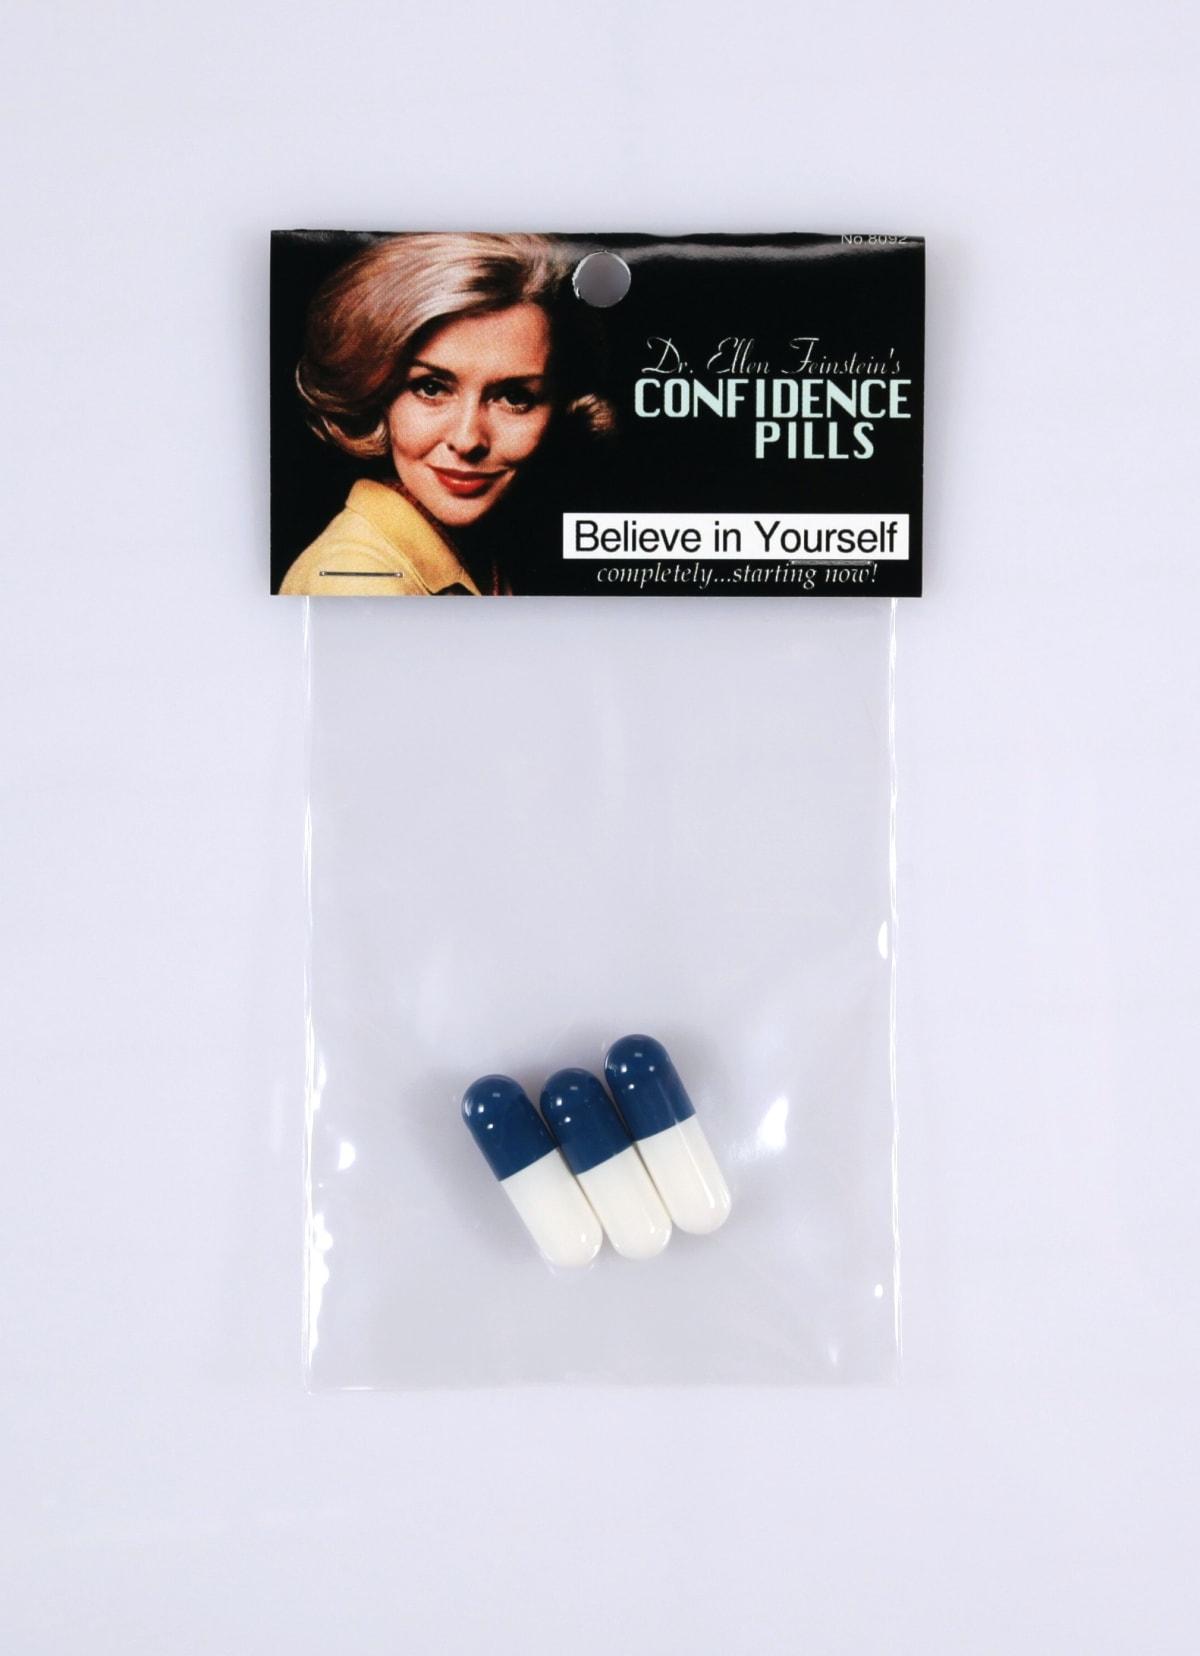 Confidence pills